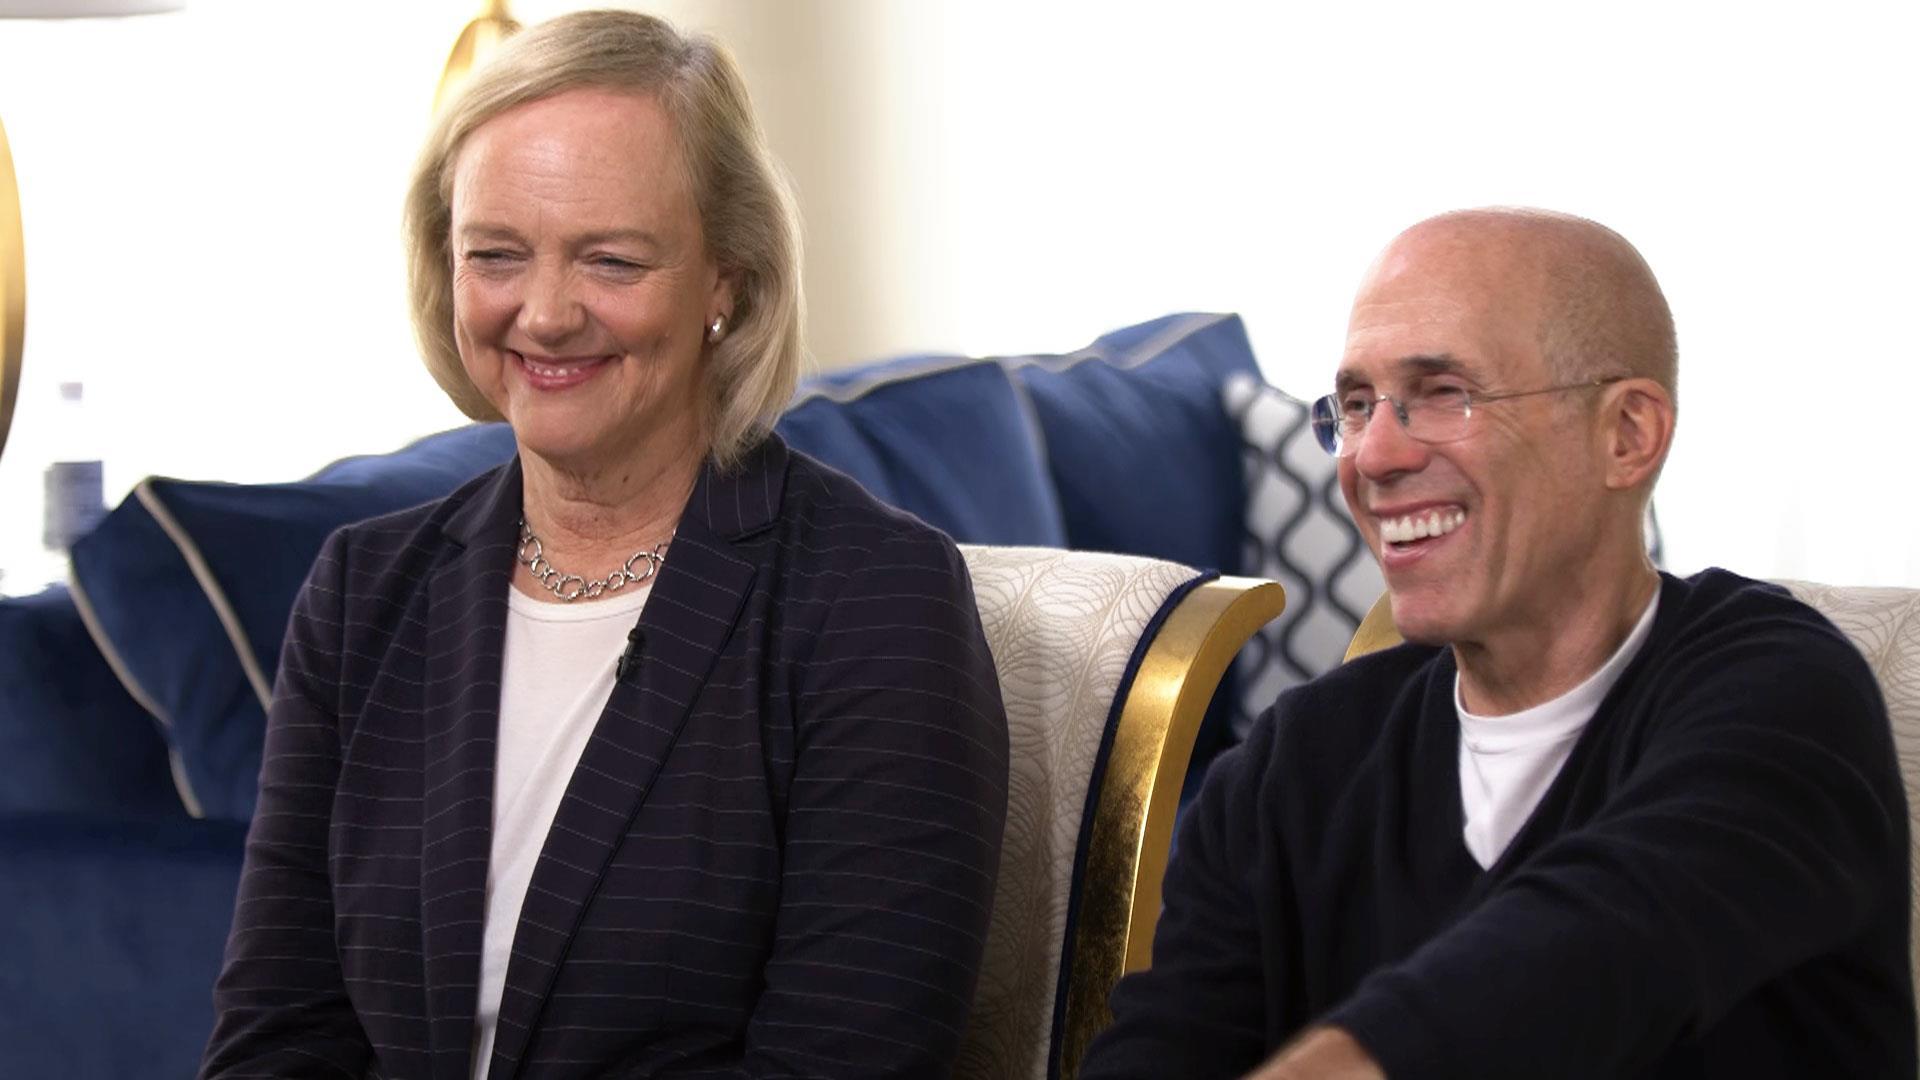 Jeffrey Katzenberg on new streaming service: 'We're not short form, we're Quibi'